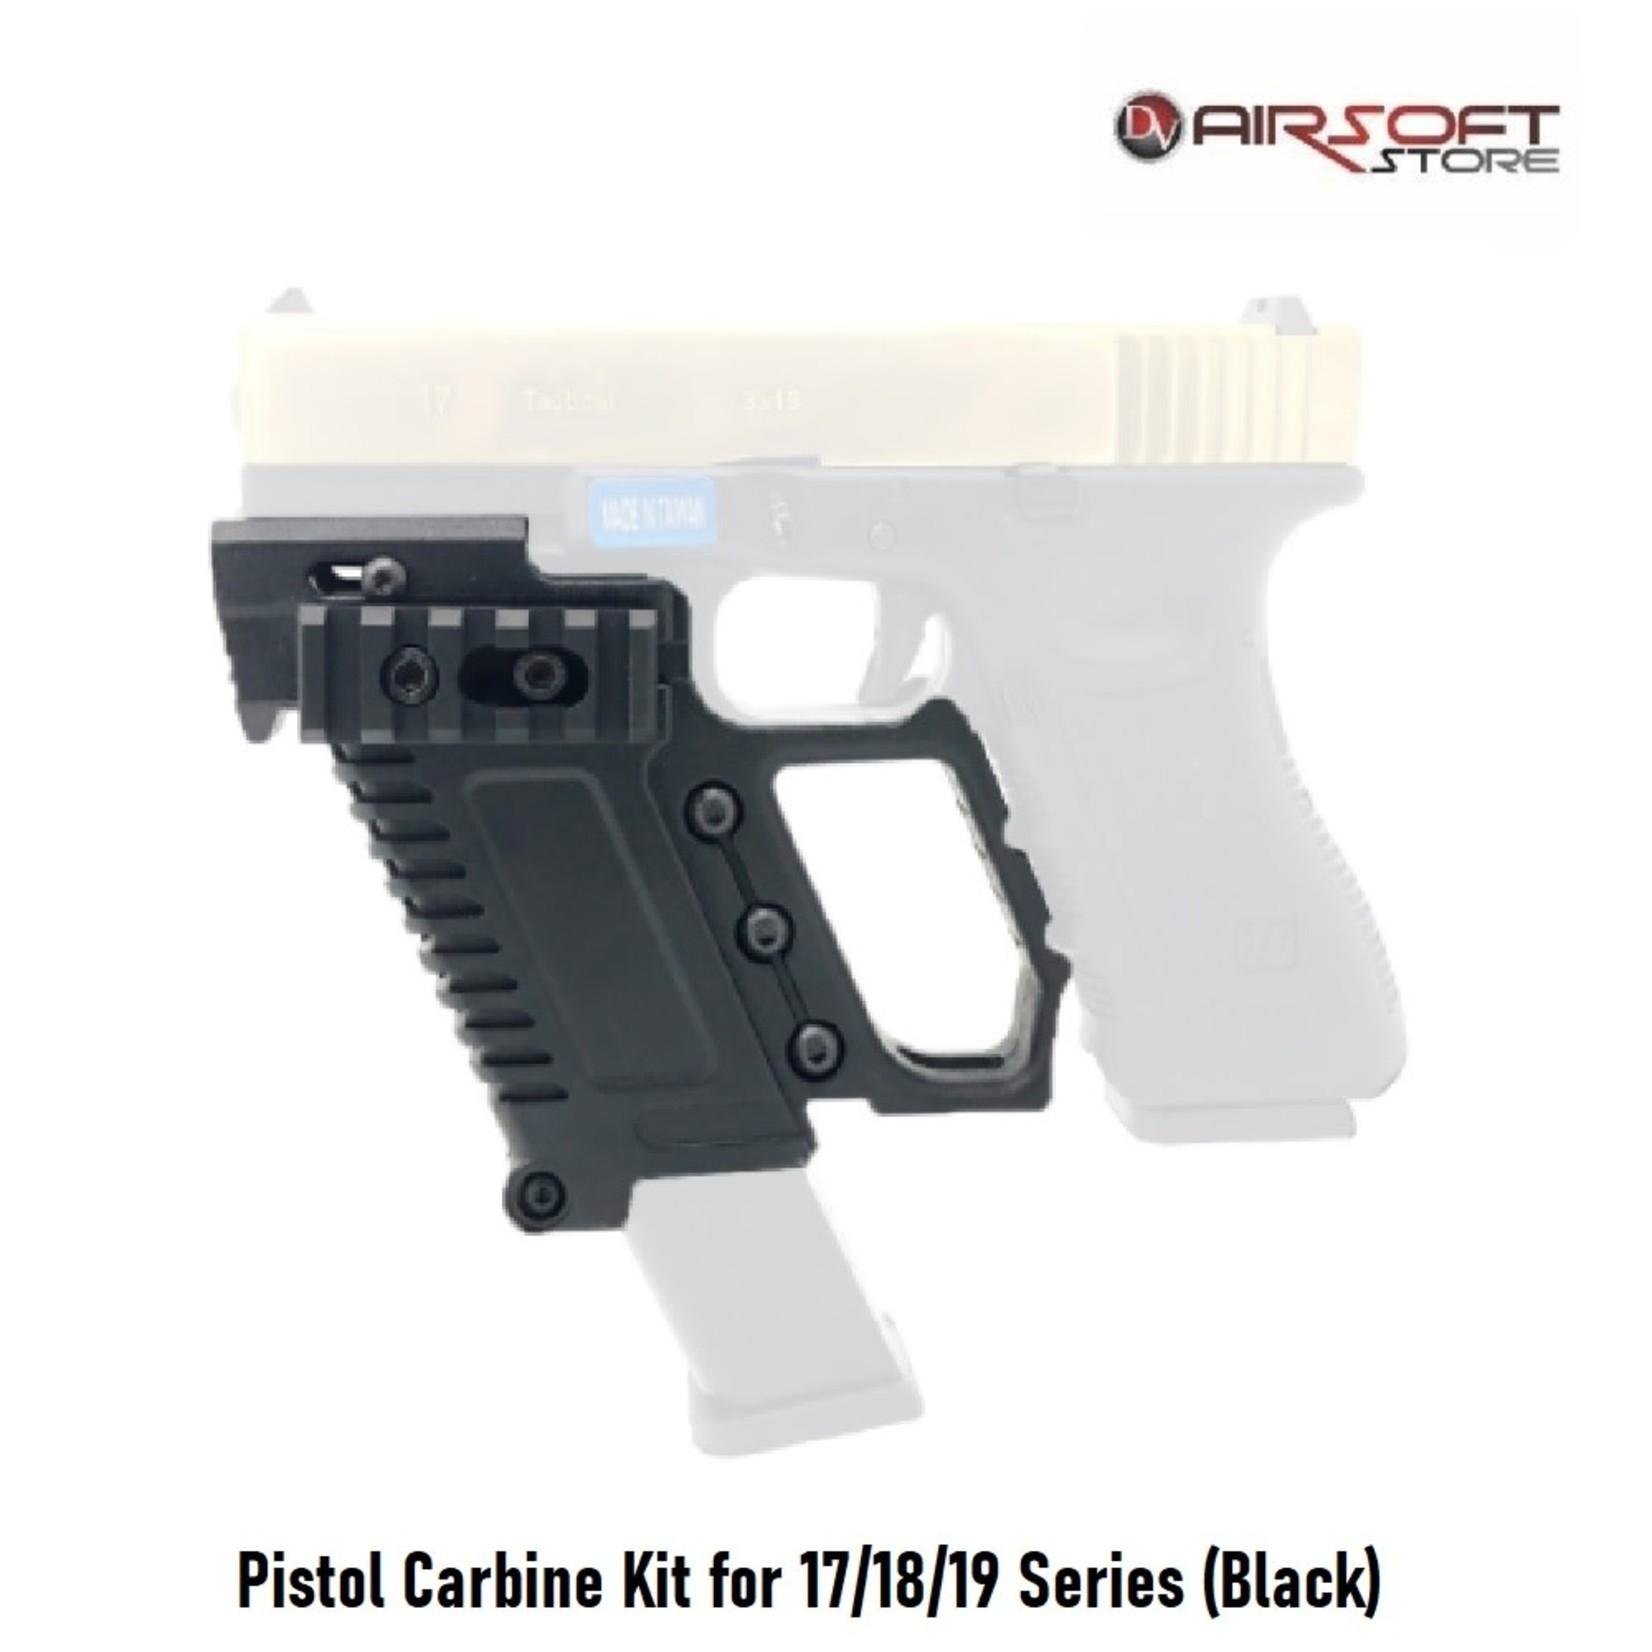 Pistol Carbine Kit for 17/18/19 Series (Black)